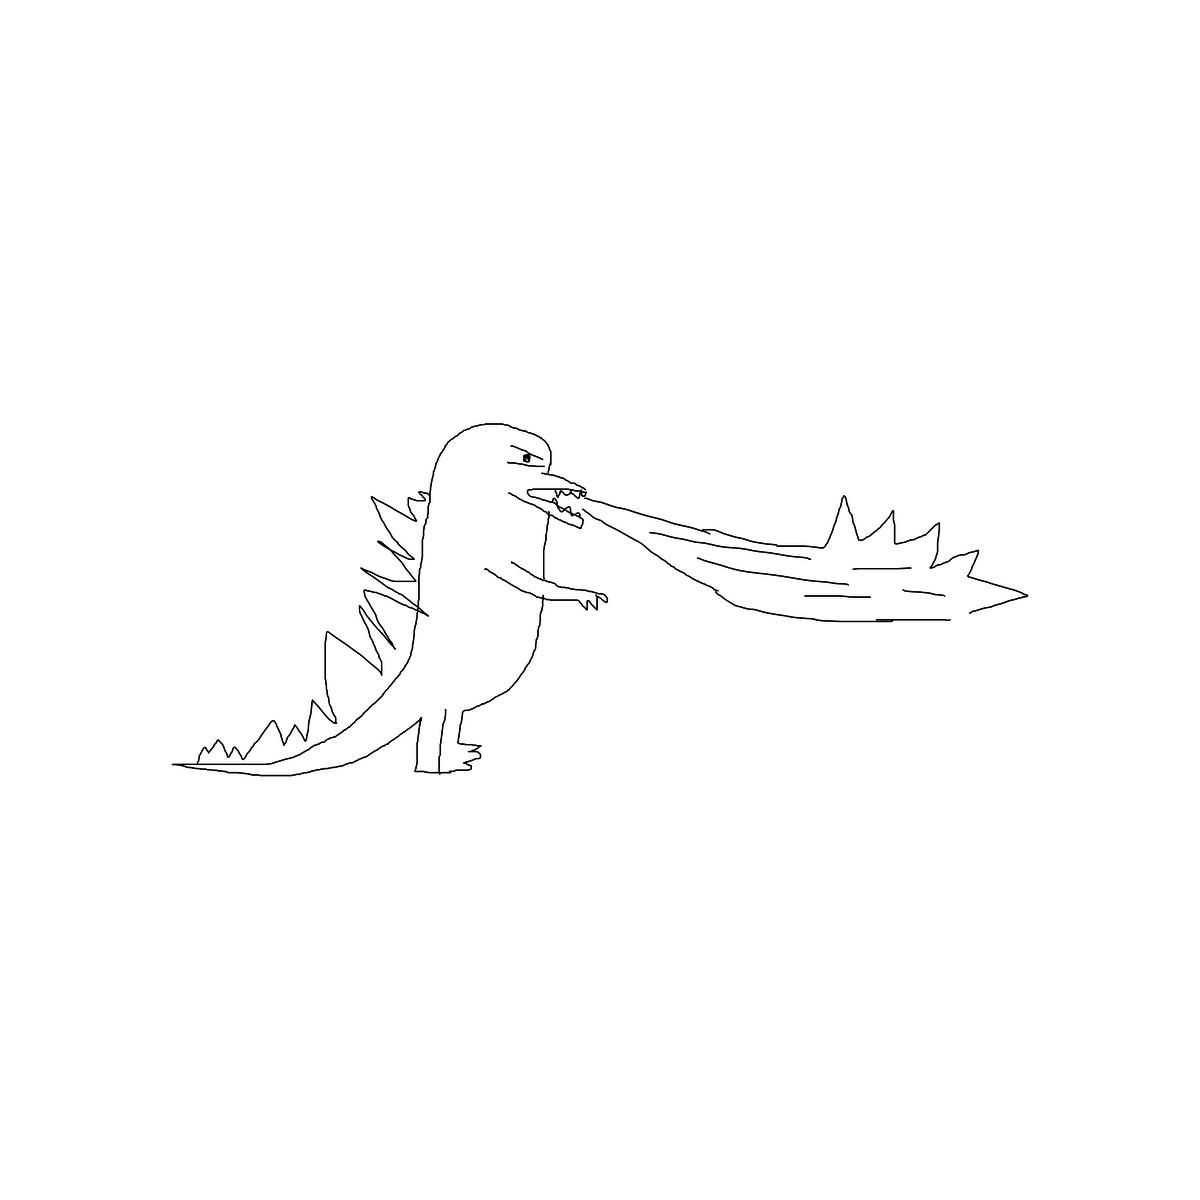 BAAAM drawing#17391 lat:35.5976676940918000lng: 139.5758056640625000